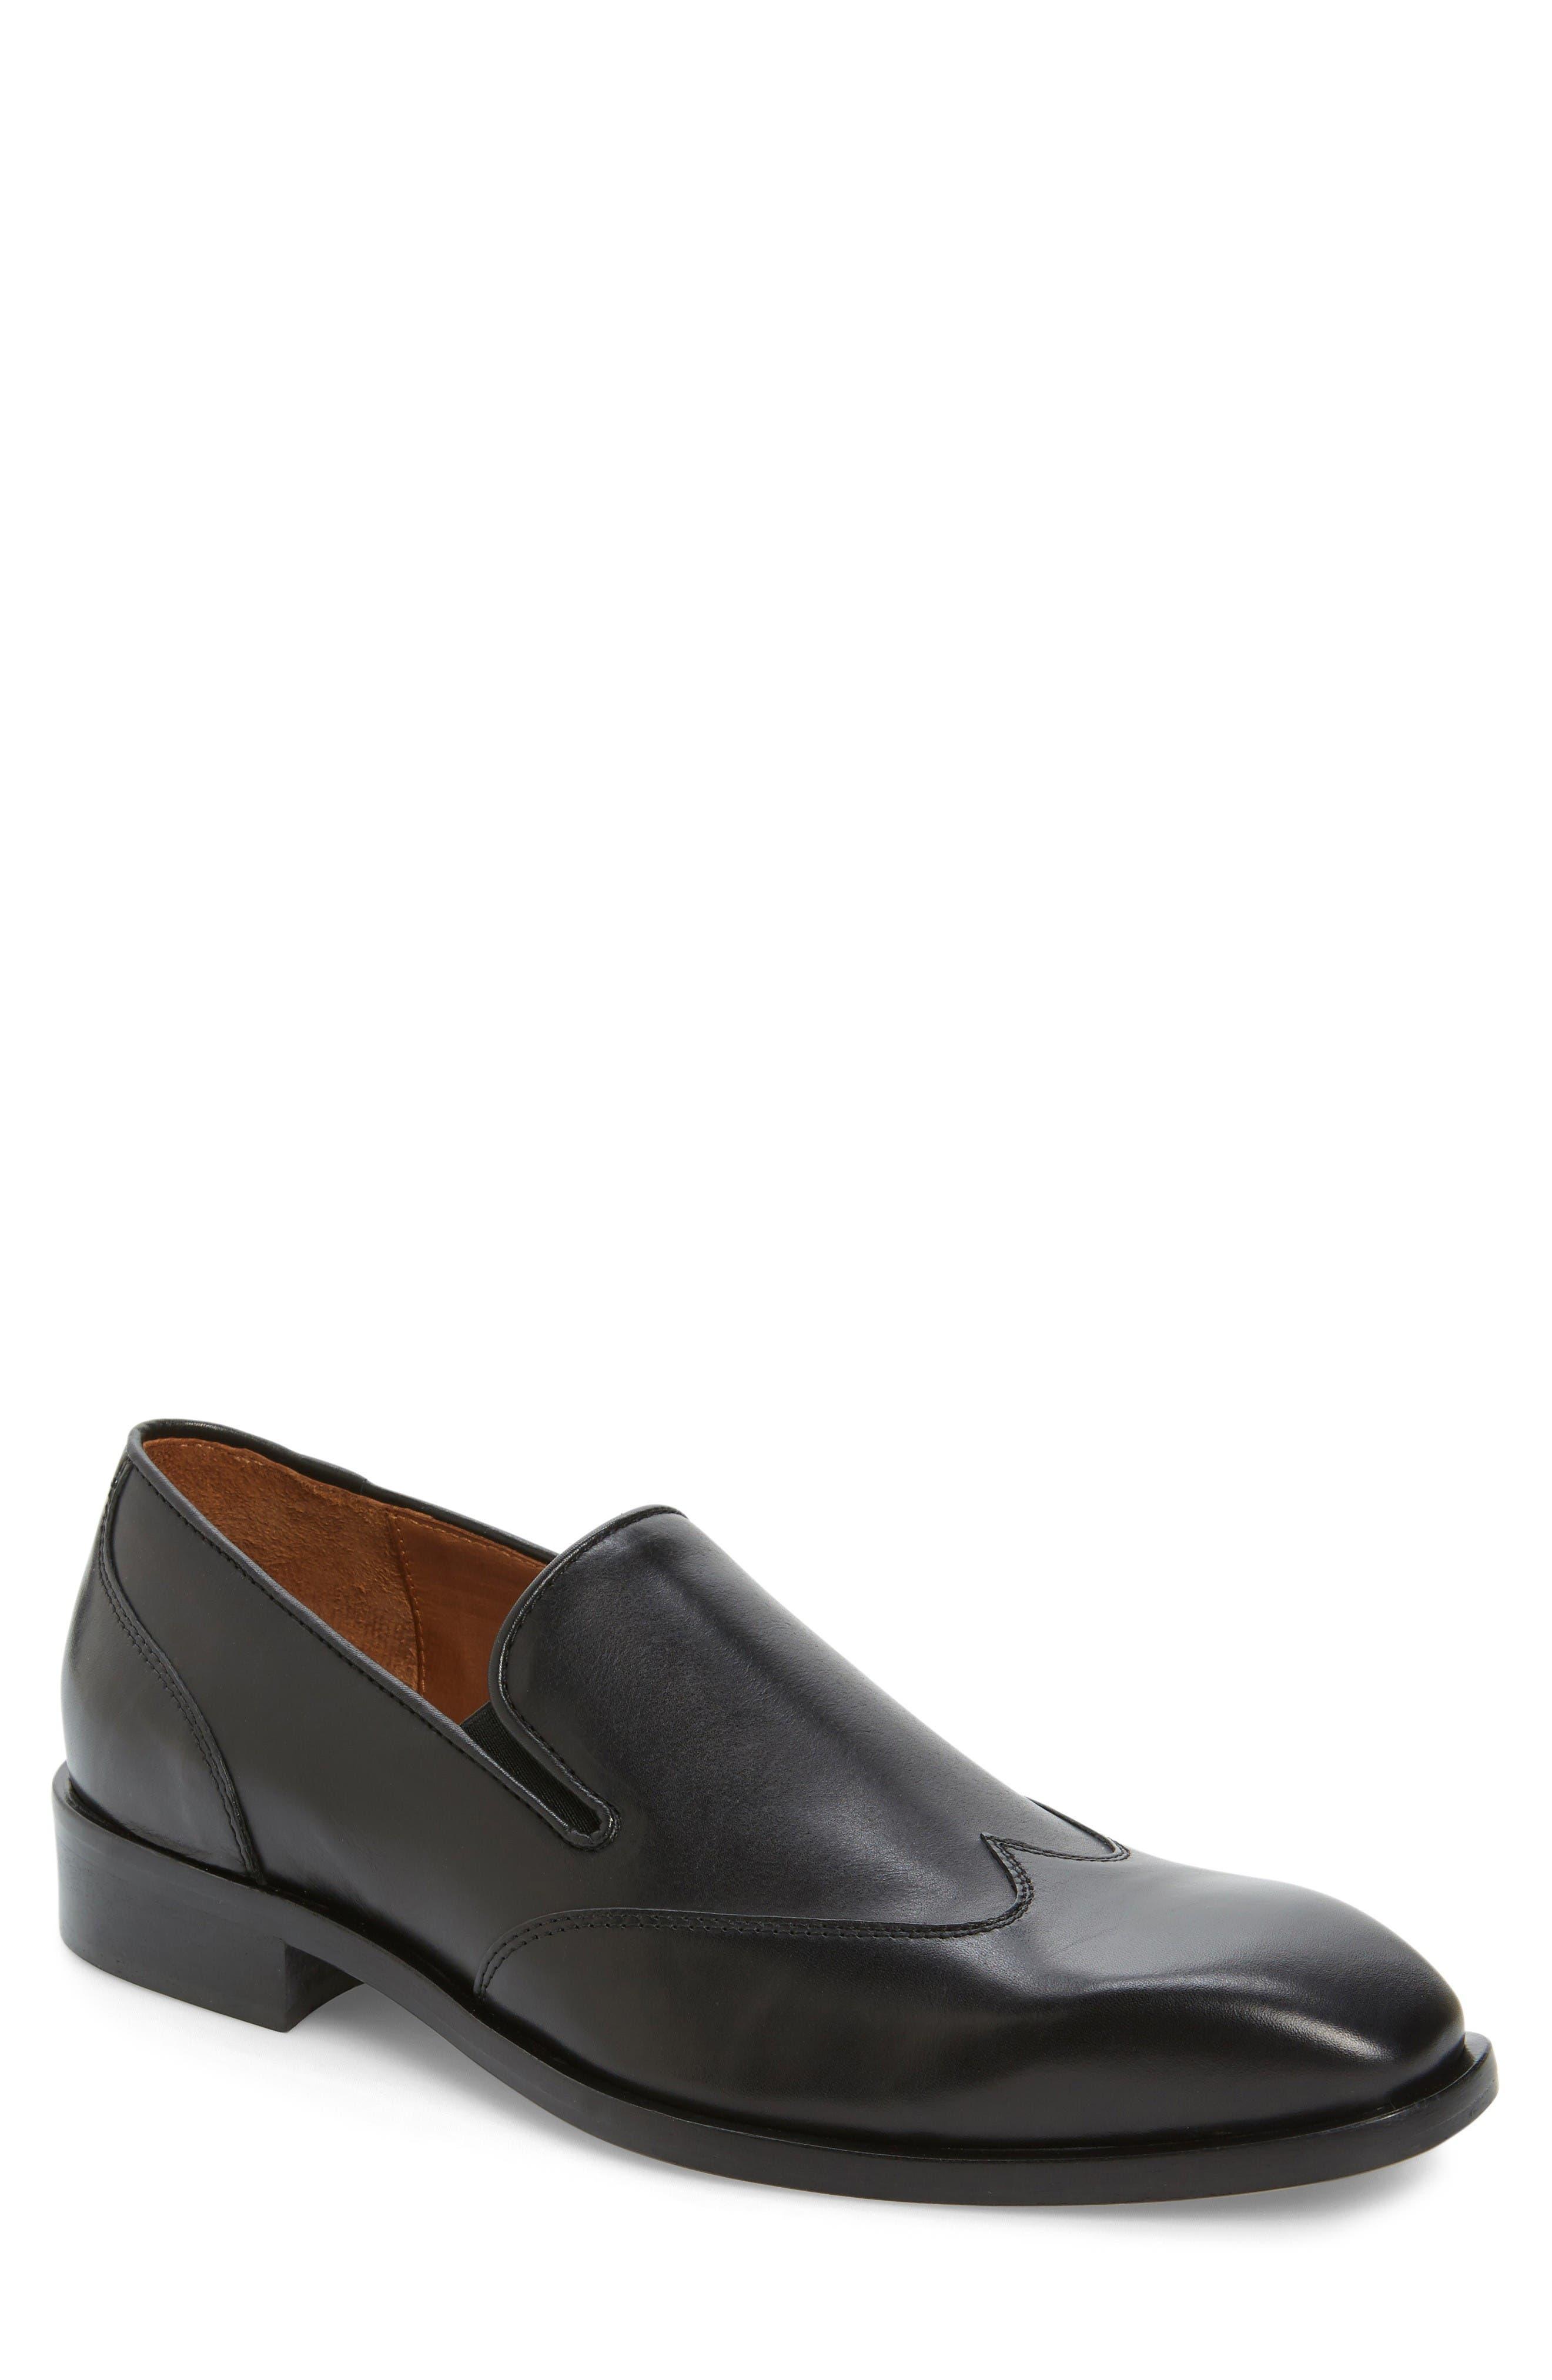 DONALD J PLINER Valente Venetian Loafer